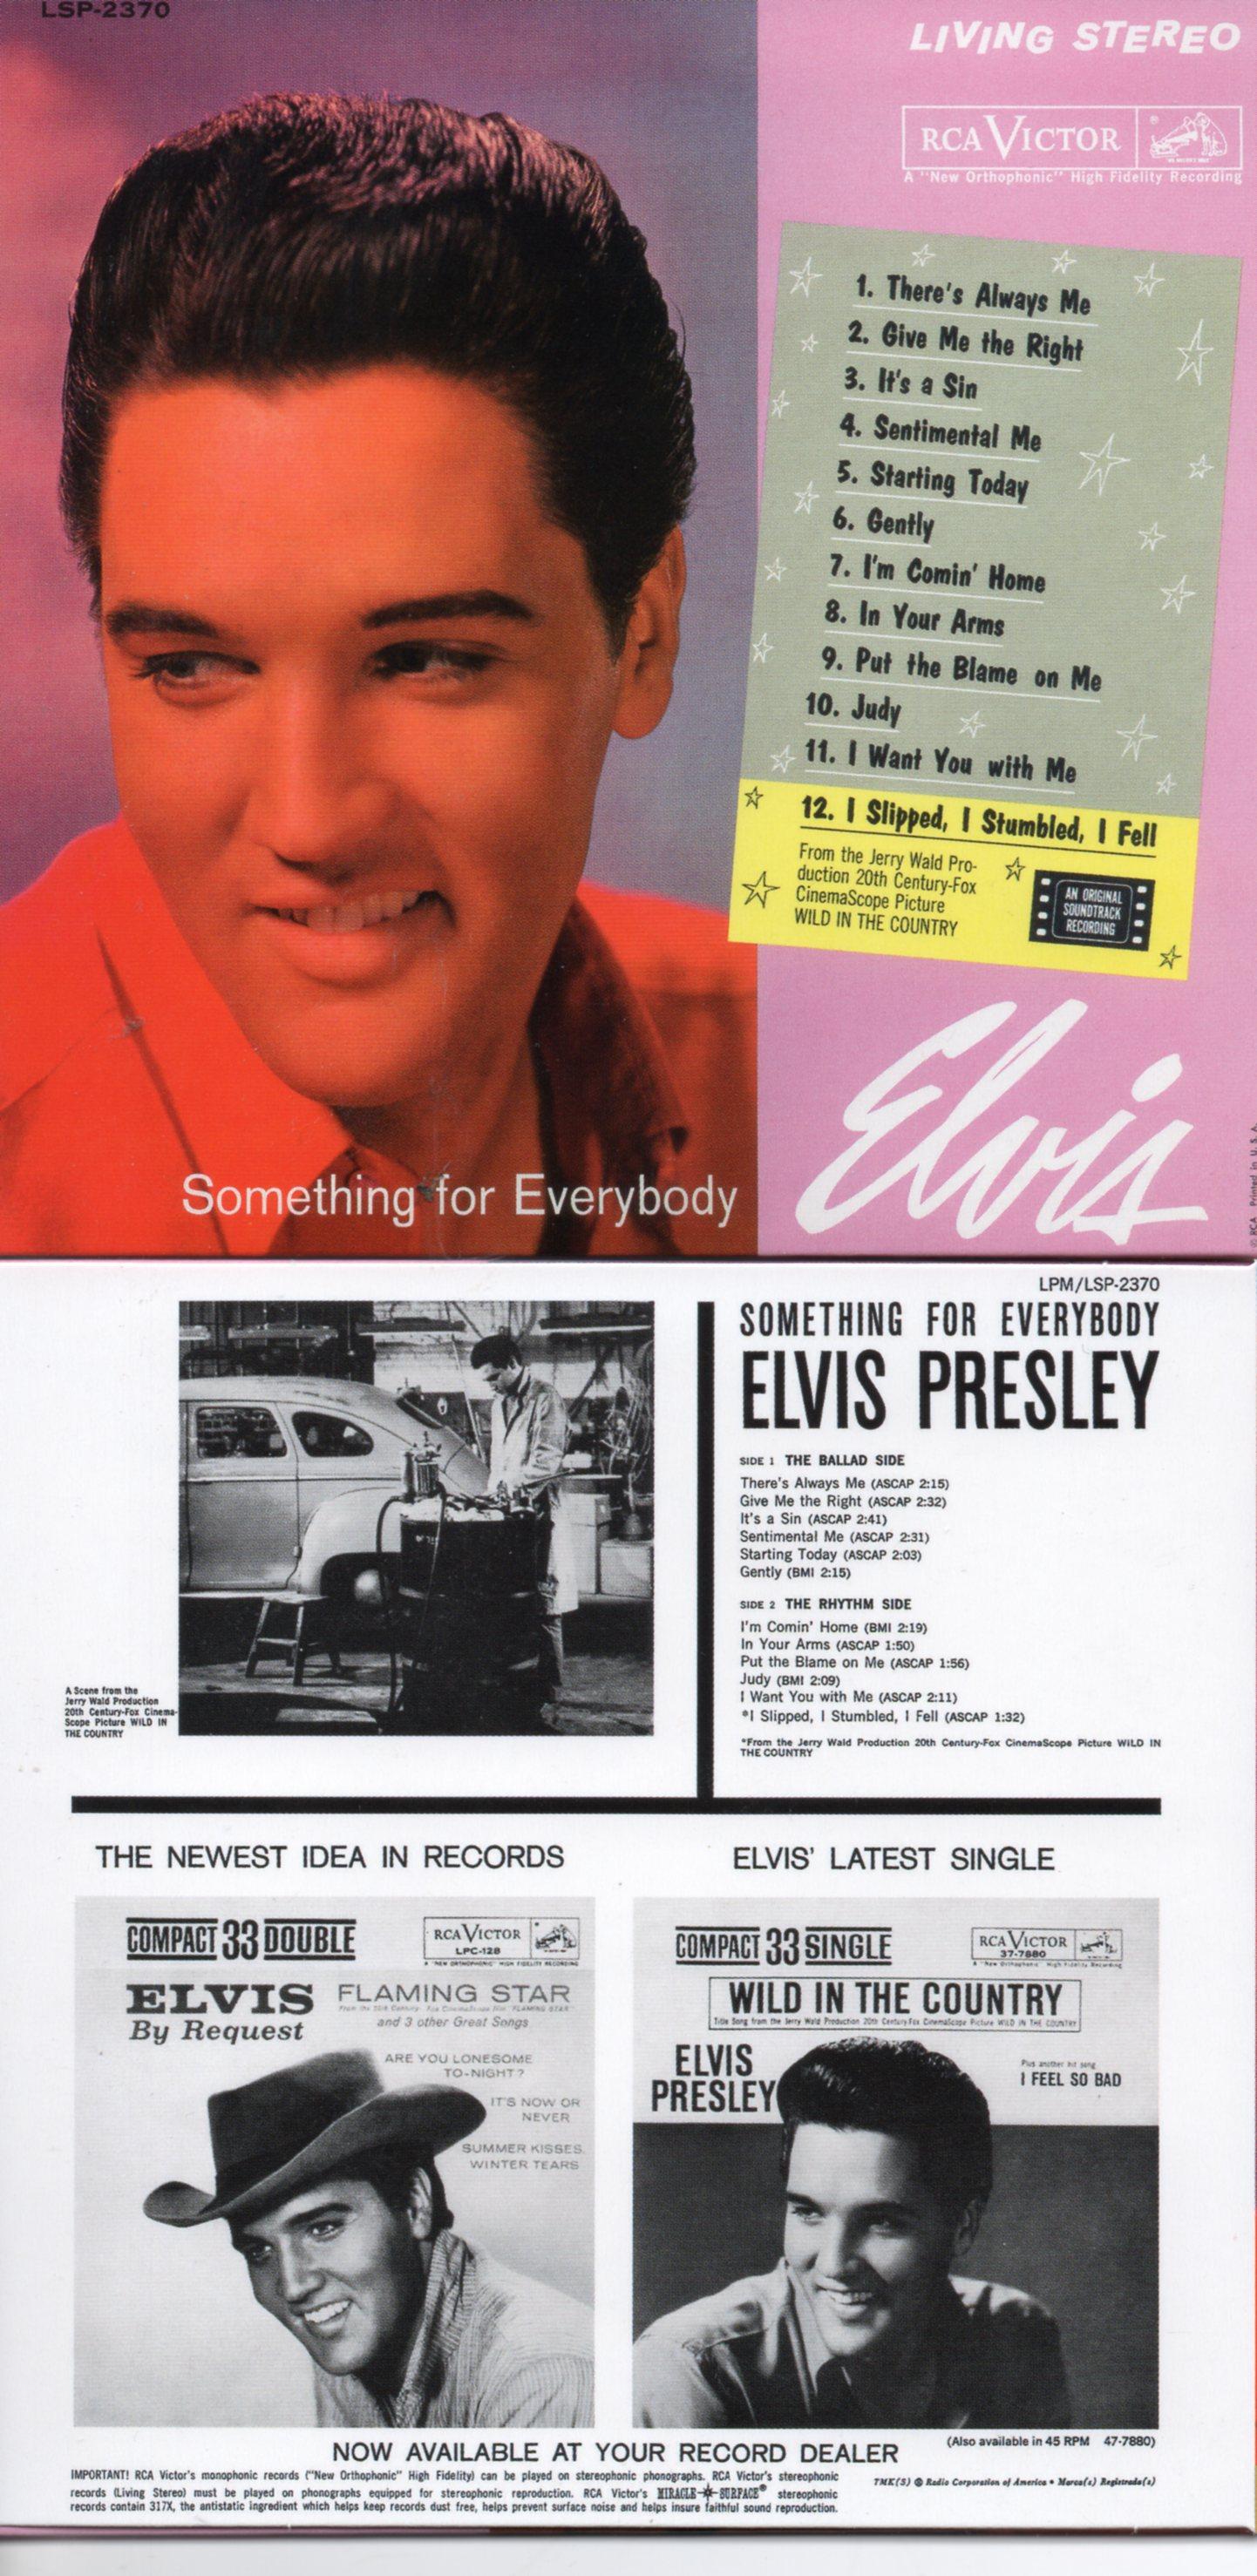 Elvis PRESLEY - Something For Everybody (1961 - Mini Lp Replica - 12-track Card Sleeve)